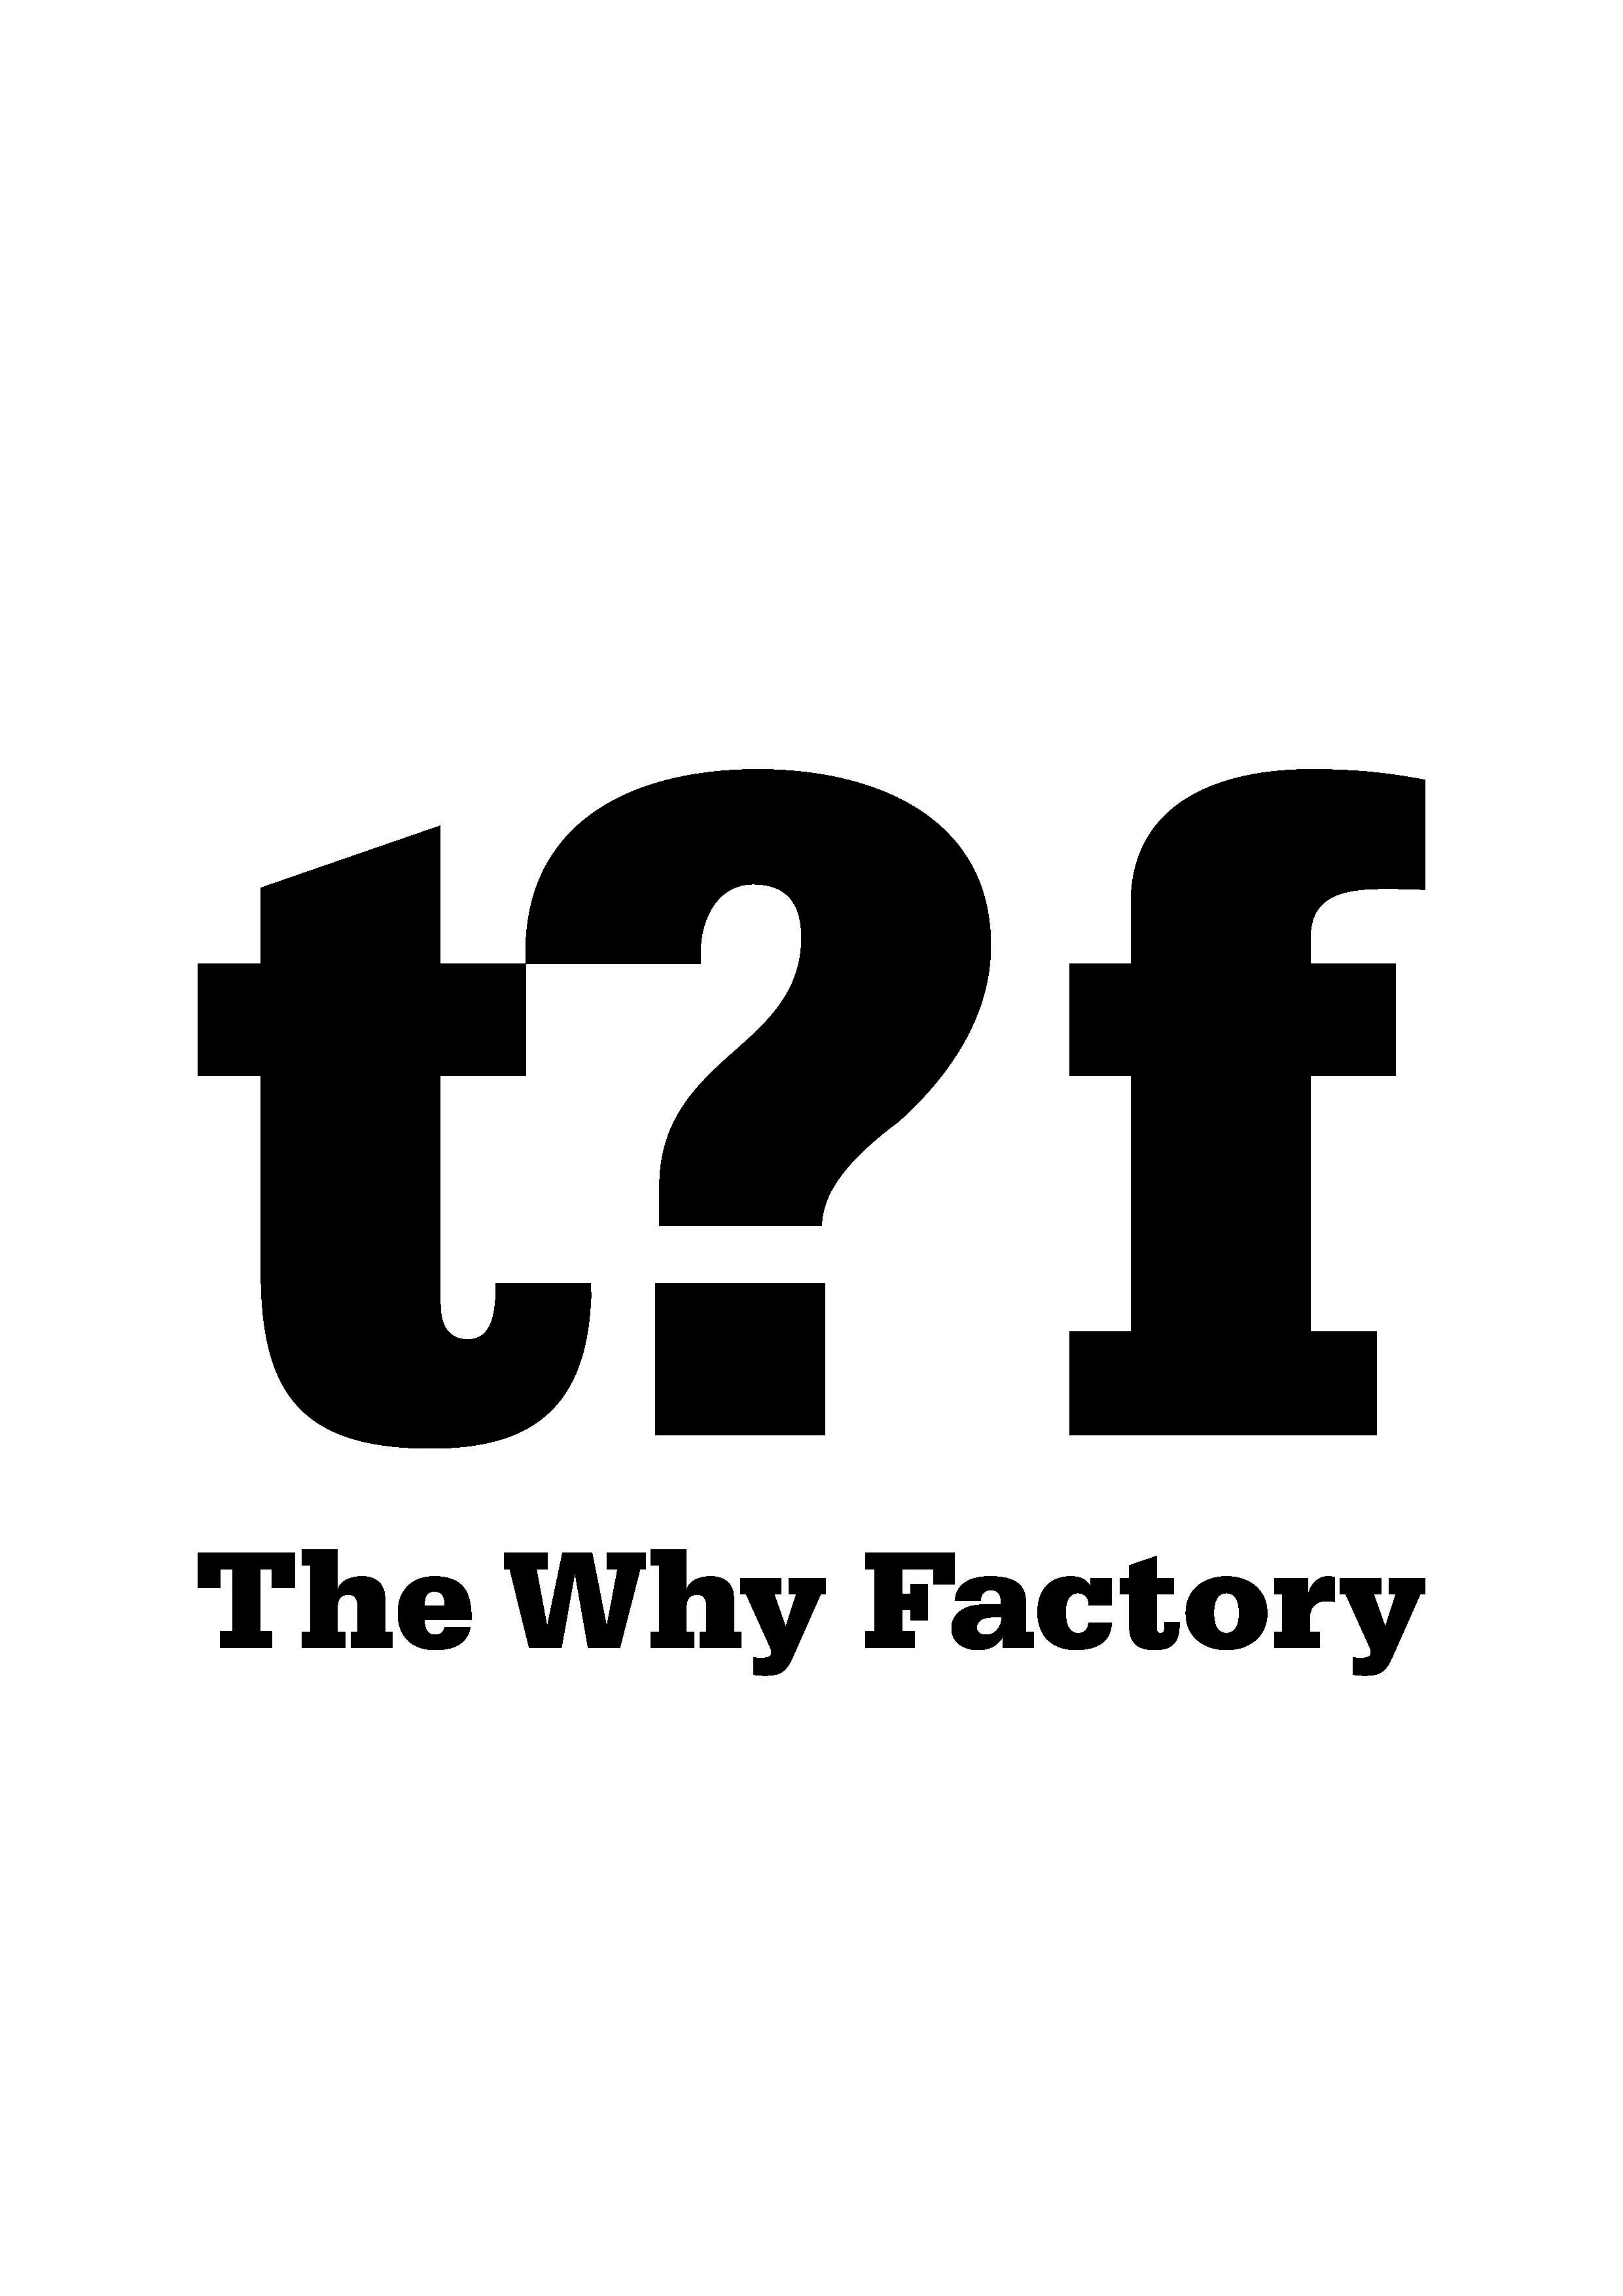 TWF_logo_01